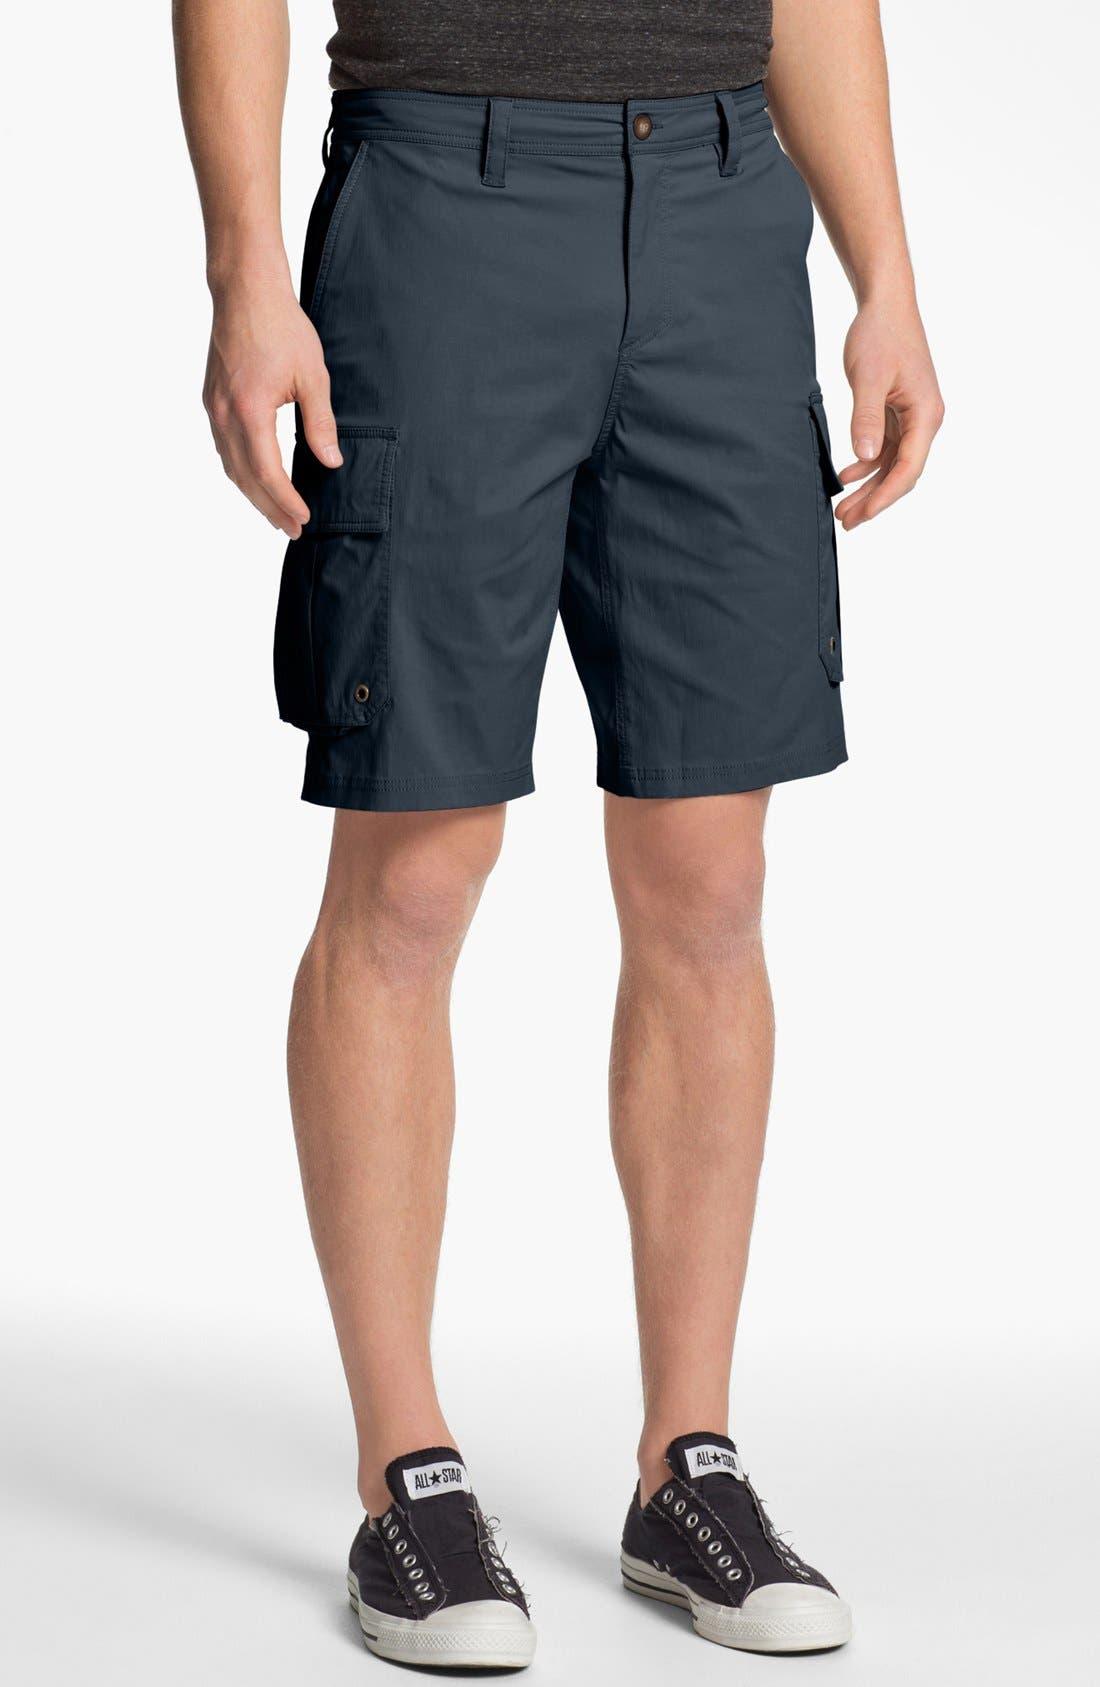 Alternate Image 1 Selected - Jack O'Neill 'Campy' Cargo Shorts